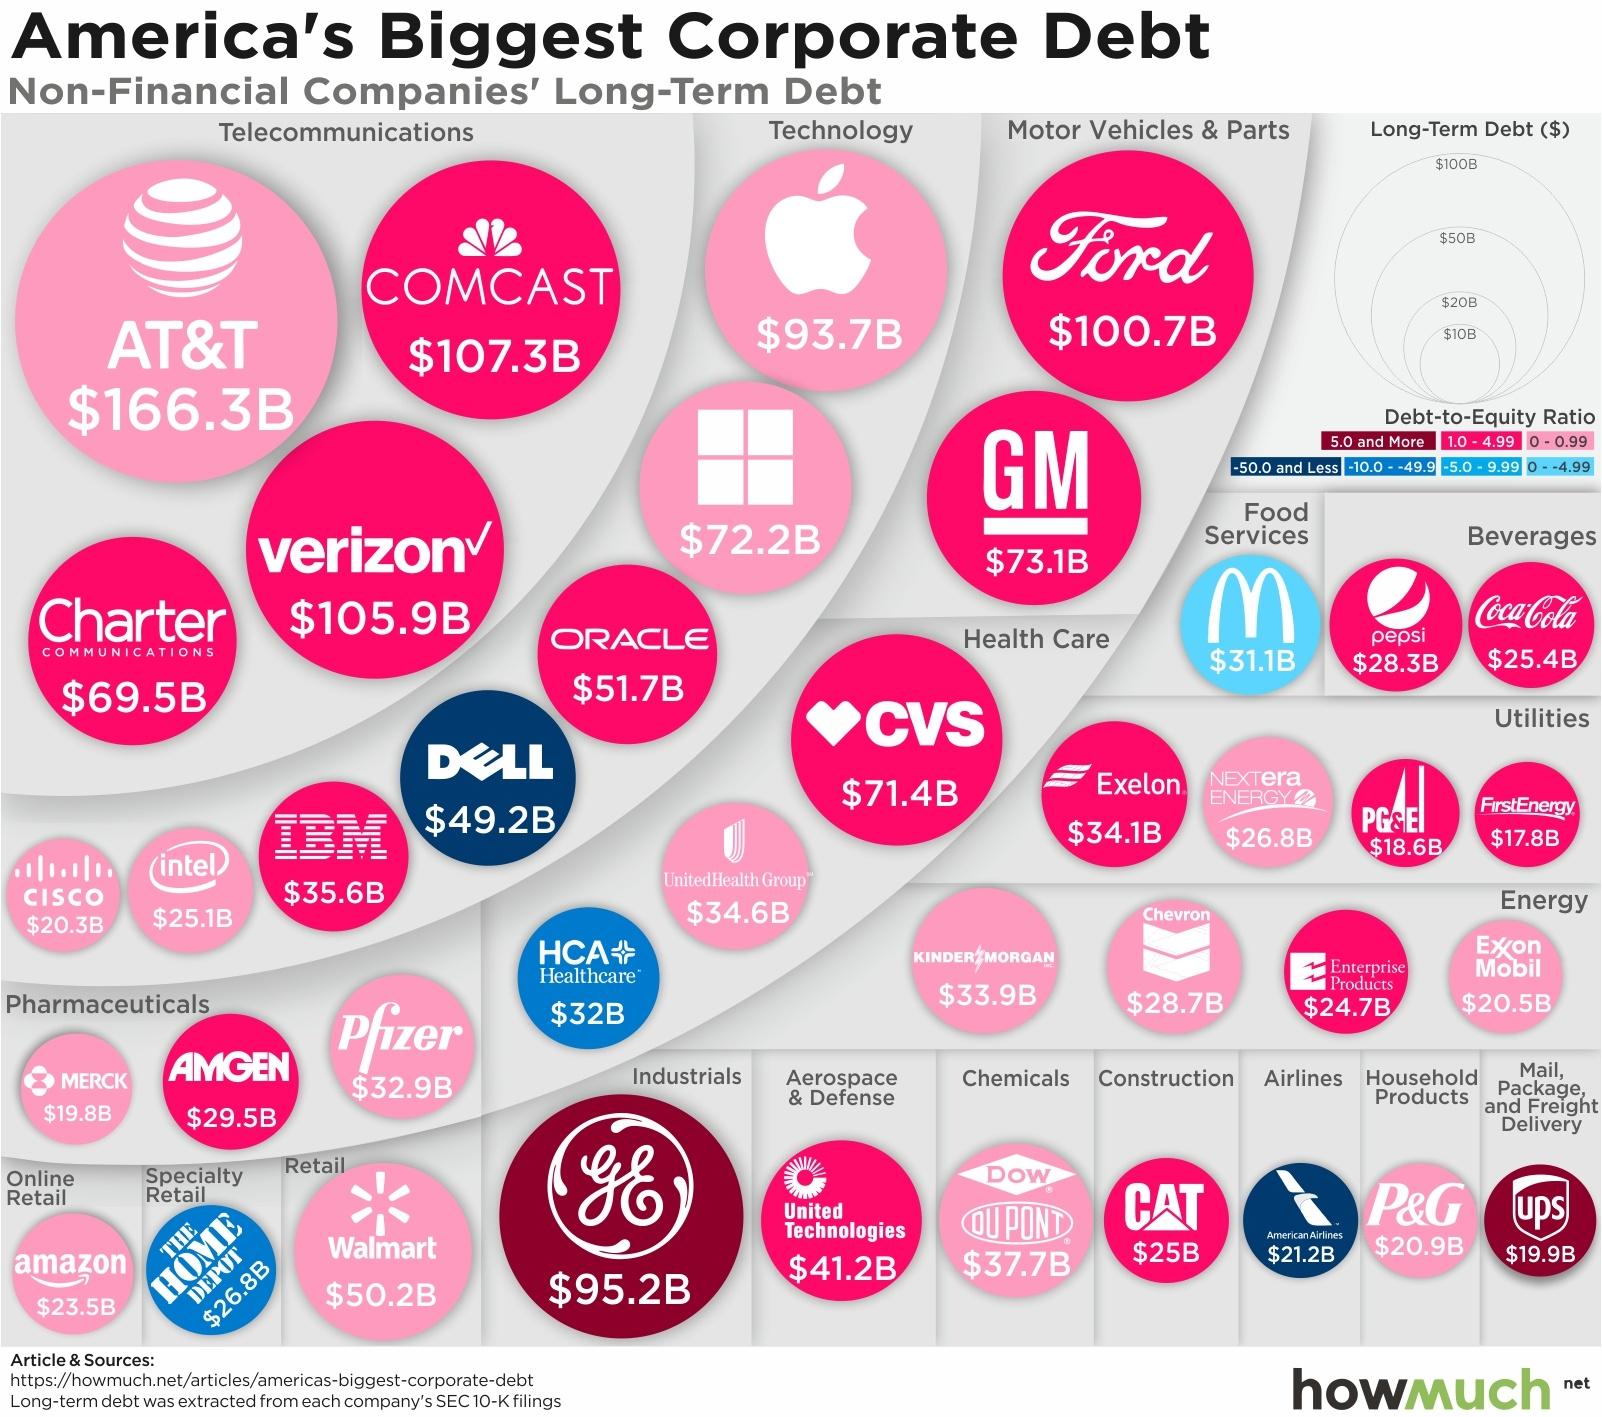 companies-with-the-highest-long-term-debt-41dd